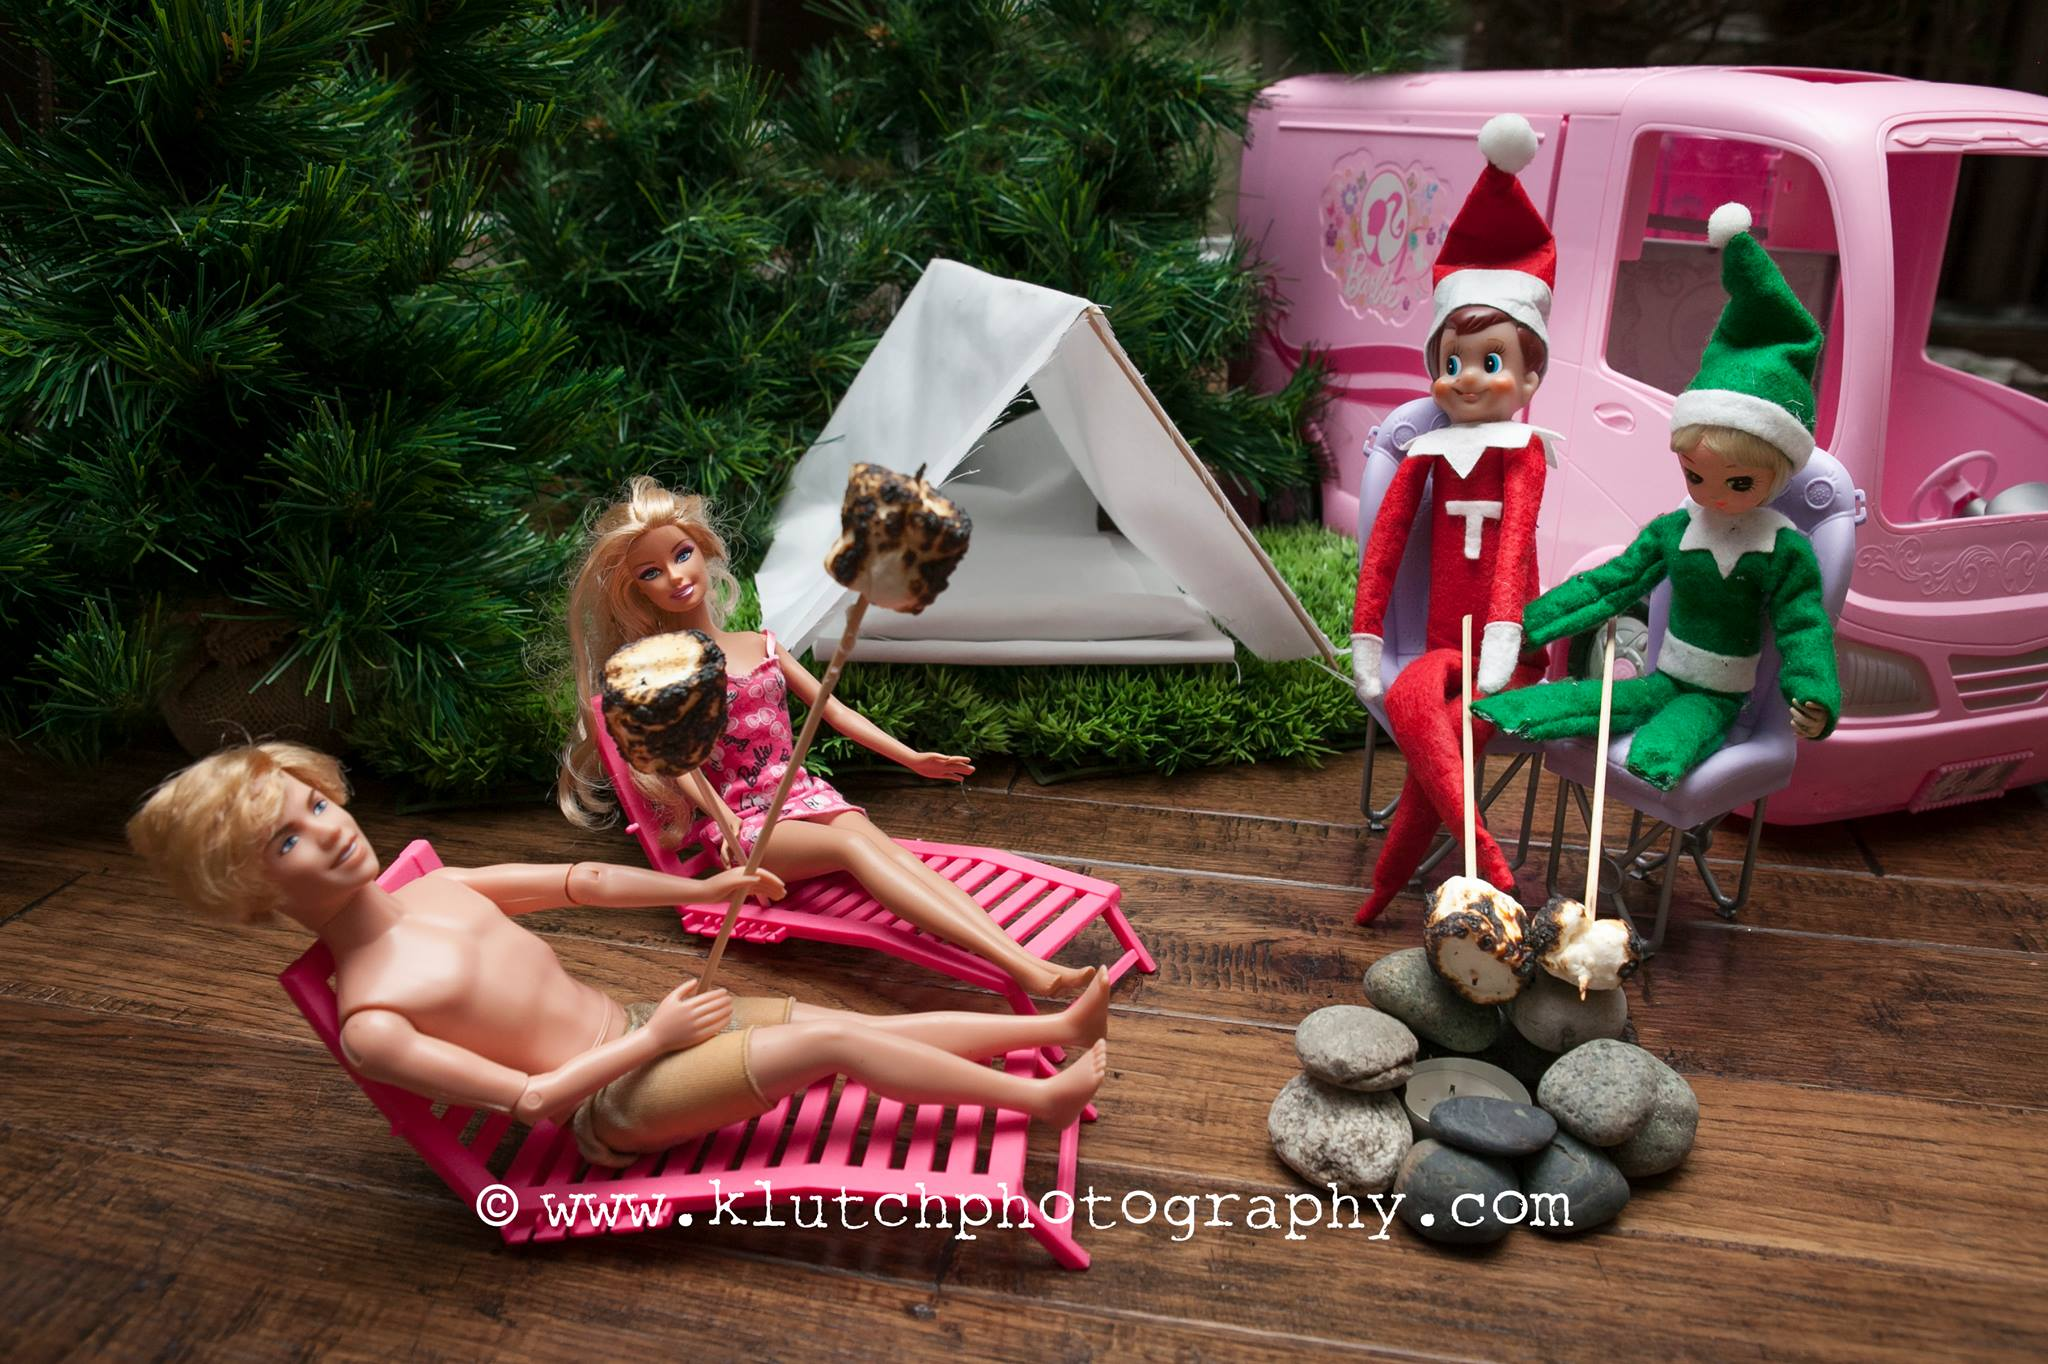 Klutch Photography, family photographer, elf on the shelf, vancouver family photographer, whiterock family photographer, lifeunscripted photographer, lifestlye photographer r.jpg